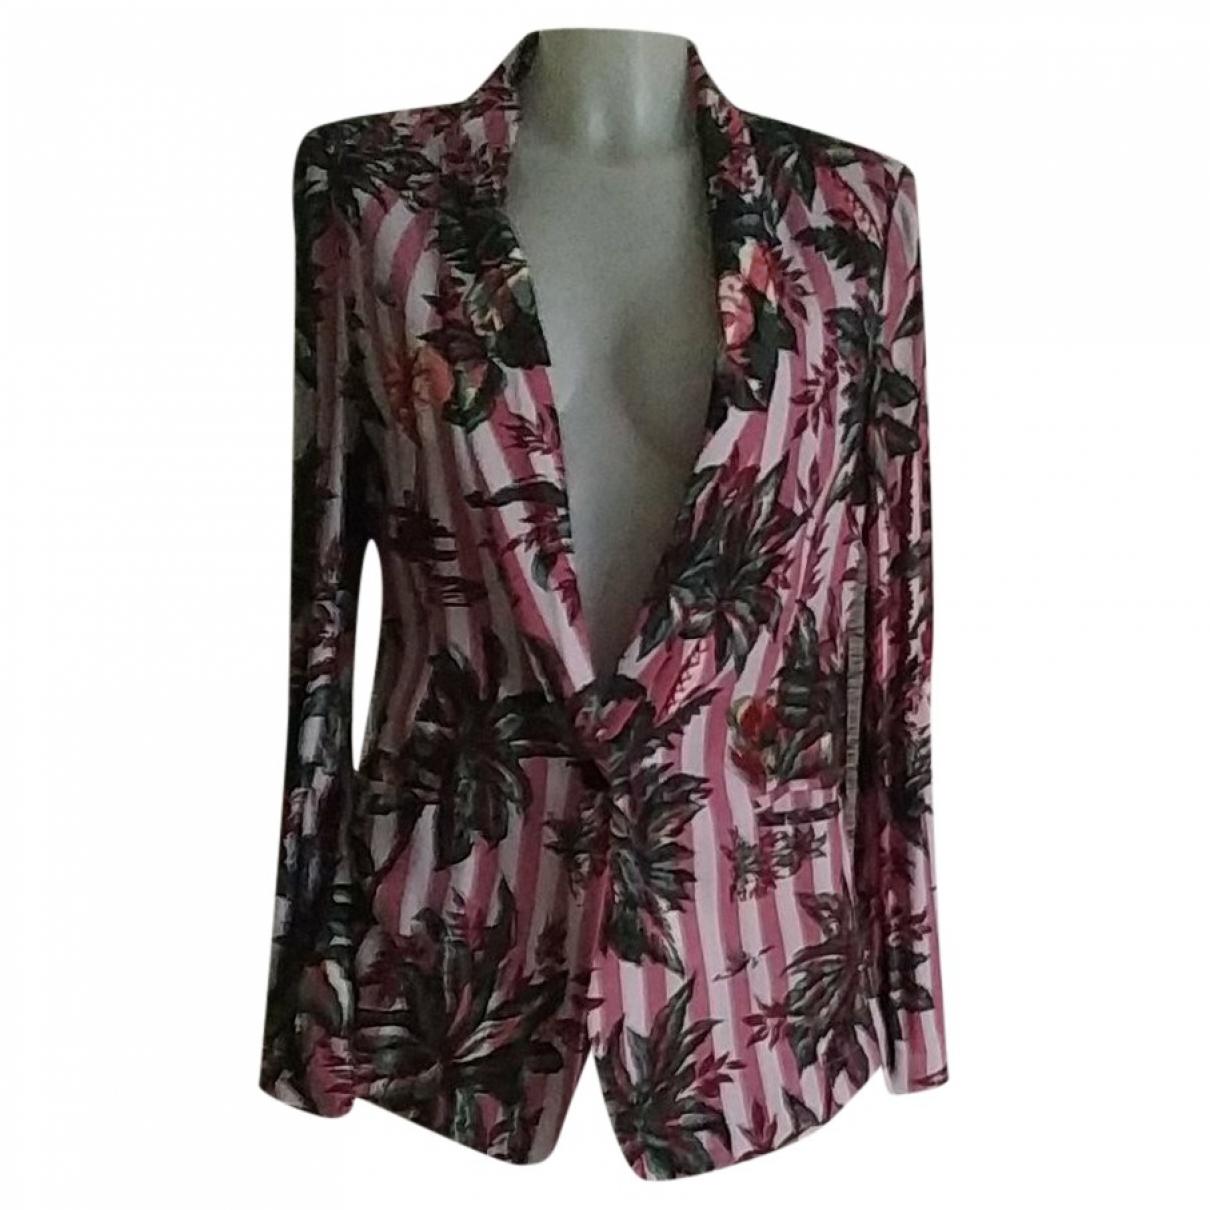 Shirtaporter \N jacket for Women 42 IT